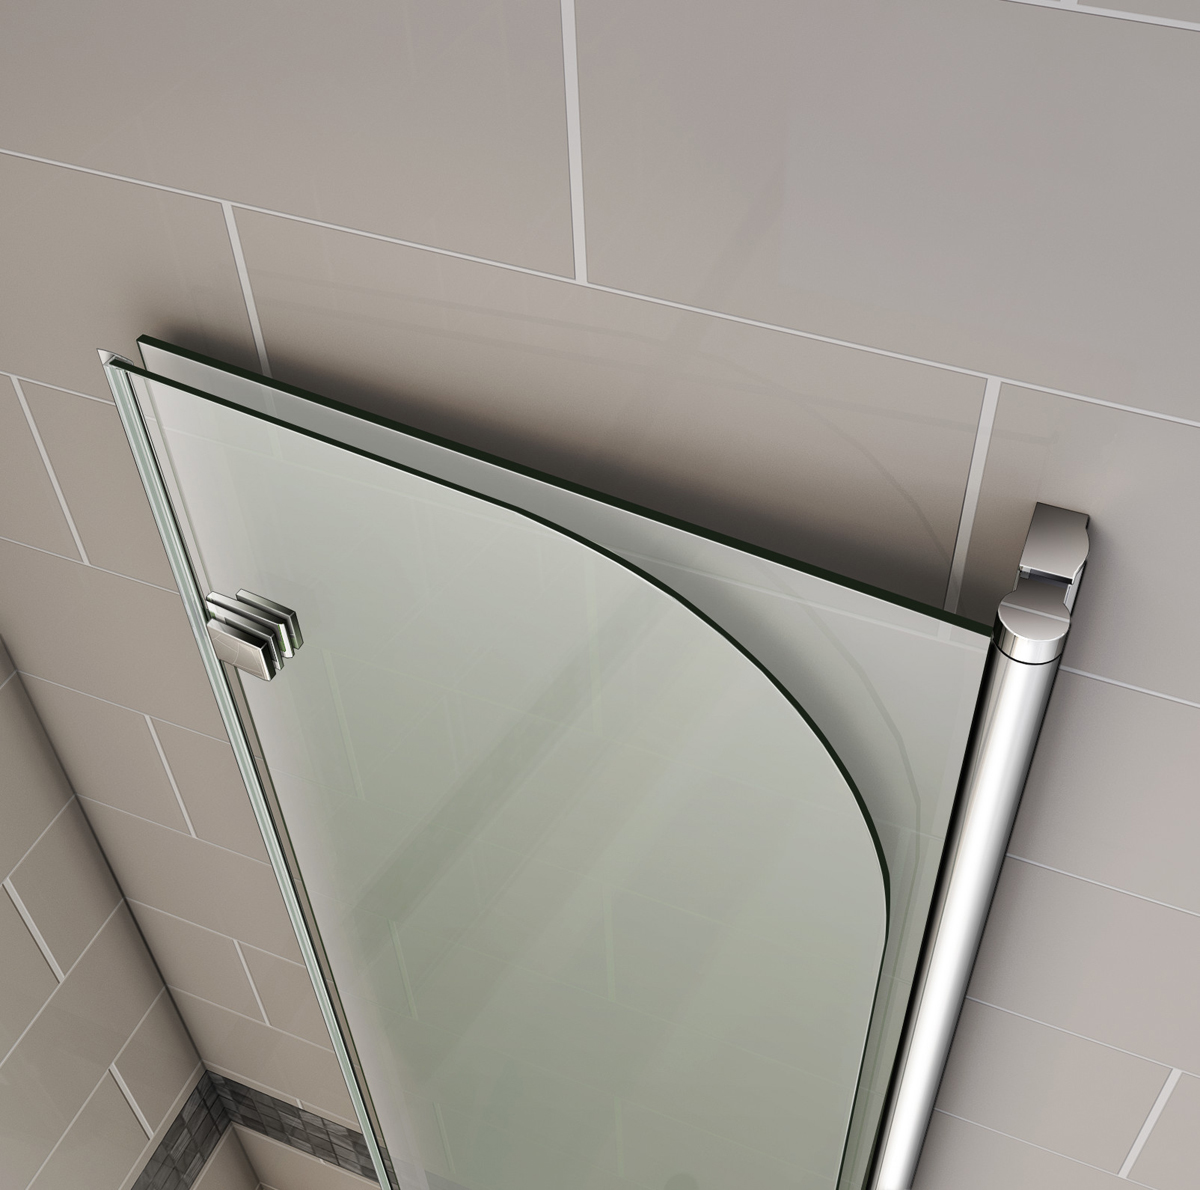 Two Panel Sliding Shower Bath Screen 180 176 Hinge Chrome 2 Fold Bath Shower Screen Door Panel 6mm